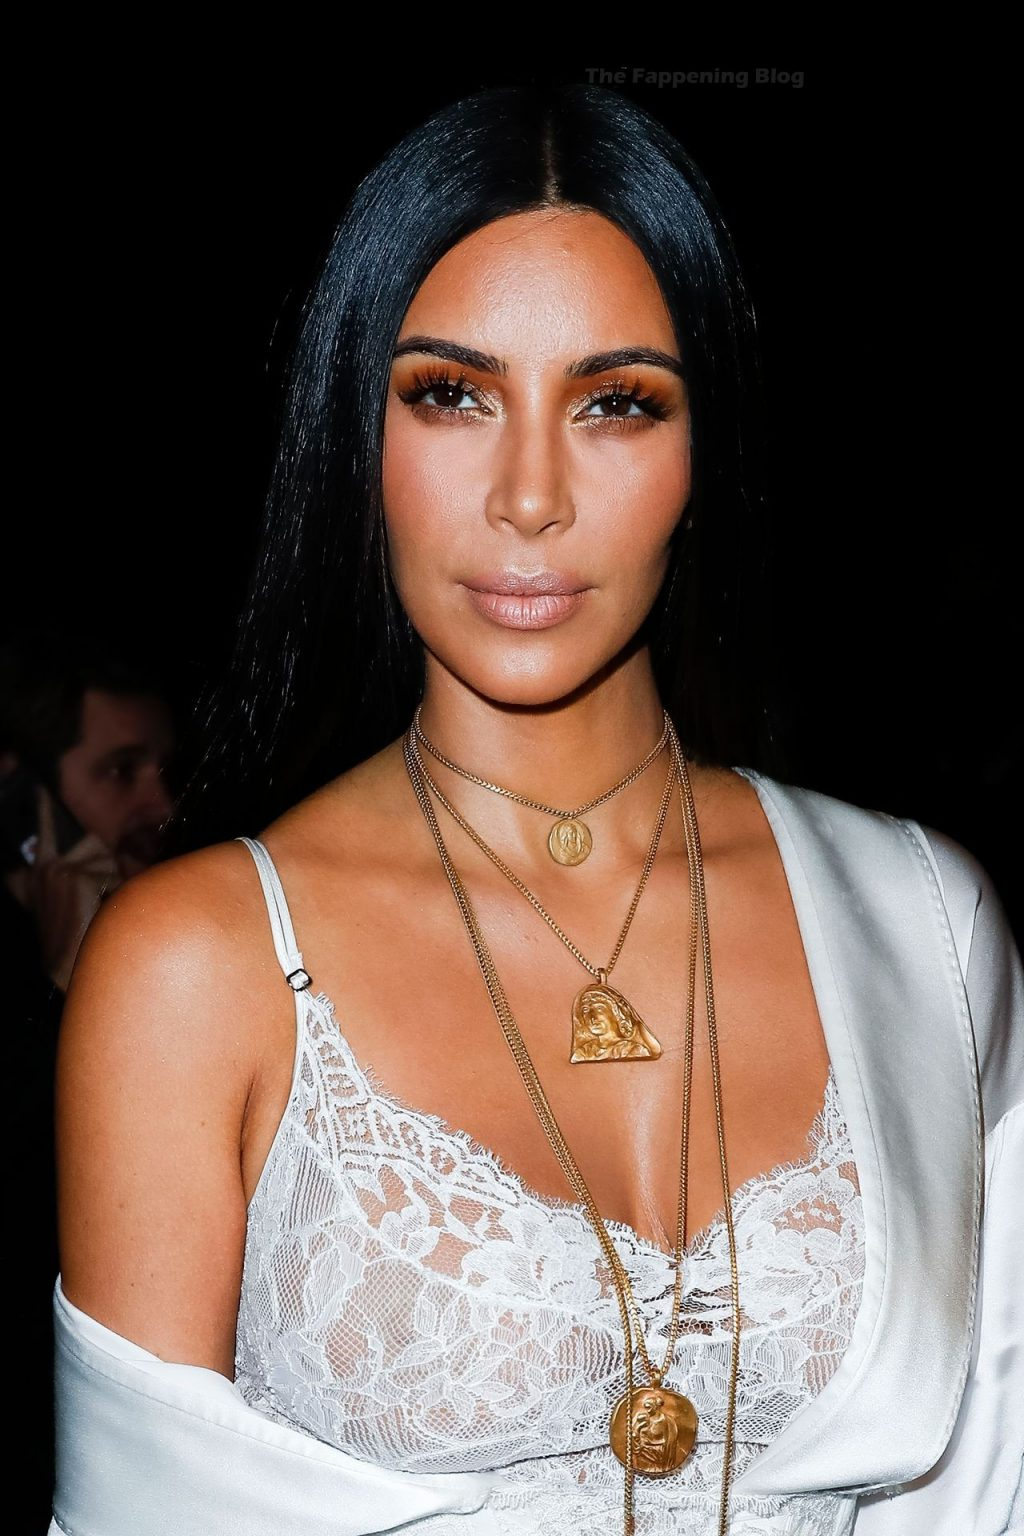 Kim Kardashian Shows Off Her Tits at the Fashion Week in Paris (3 Photos)